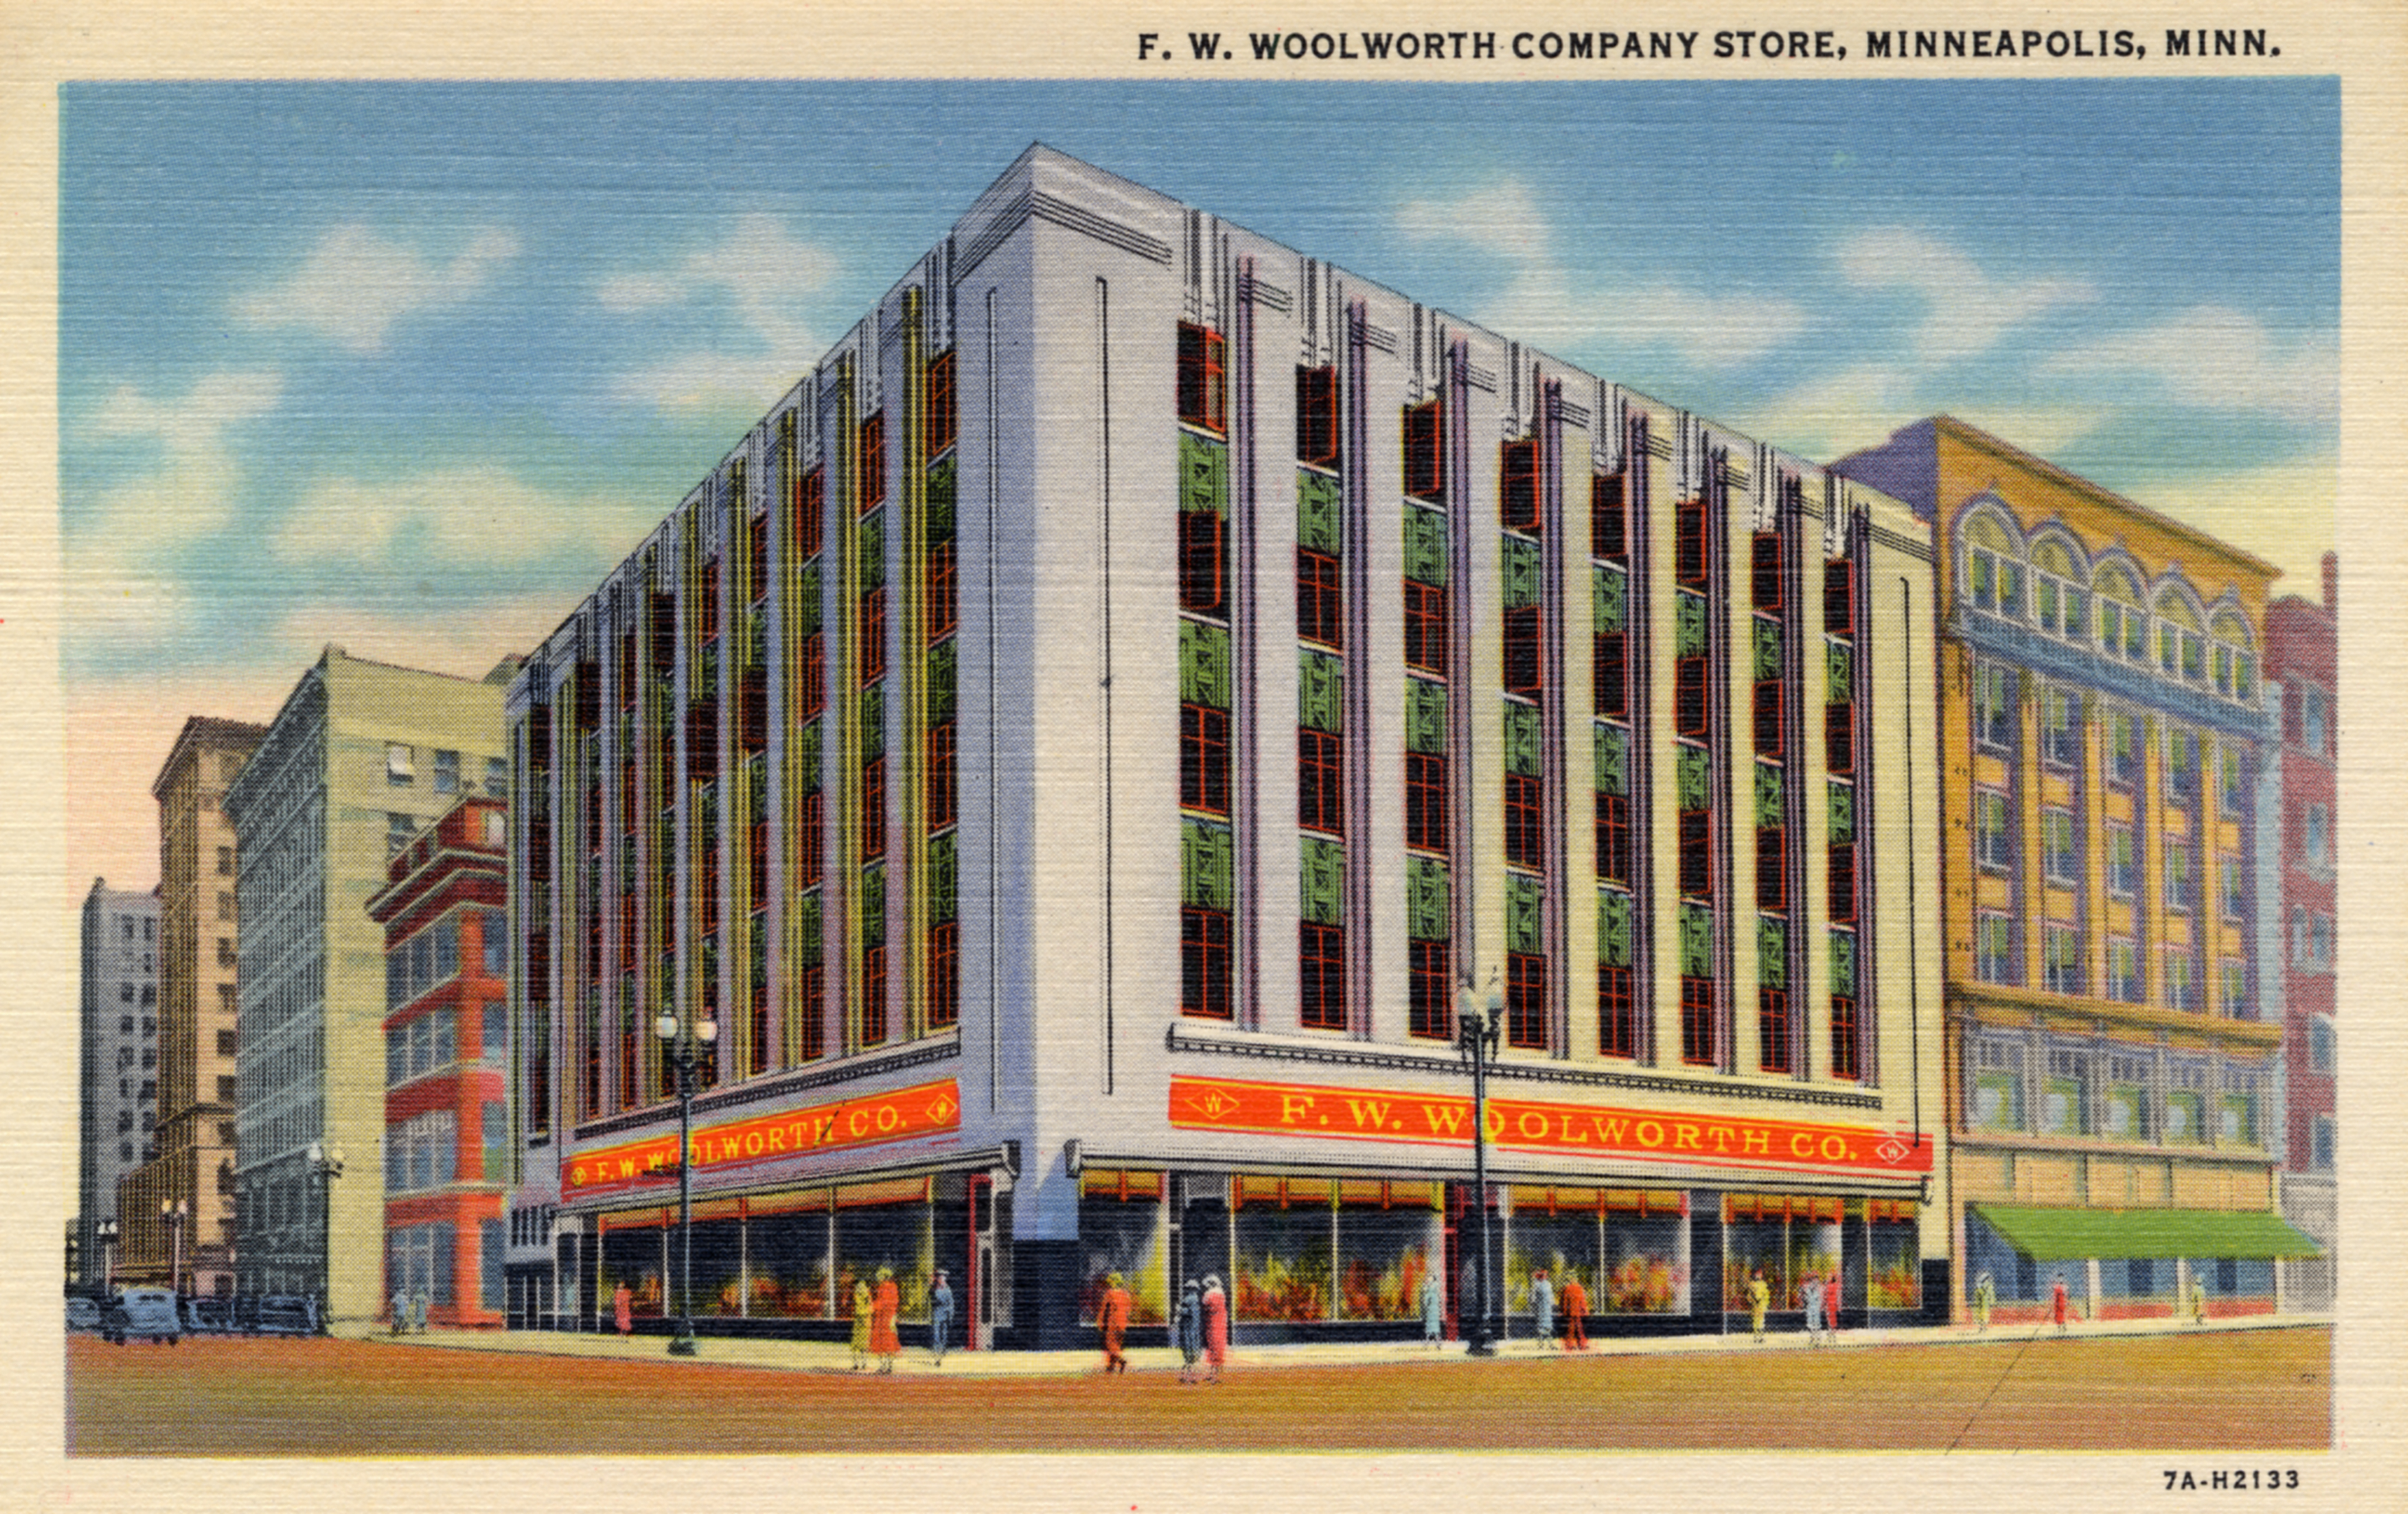 F. W. Woolworth Company Store, Minneapolis, Minnesota